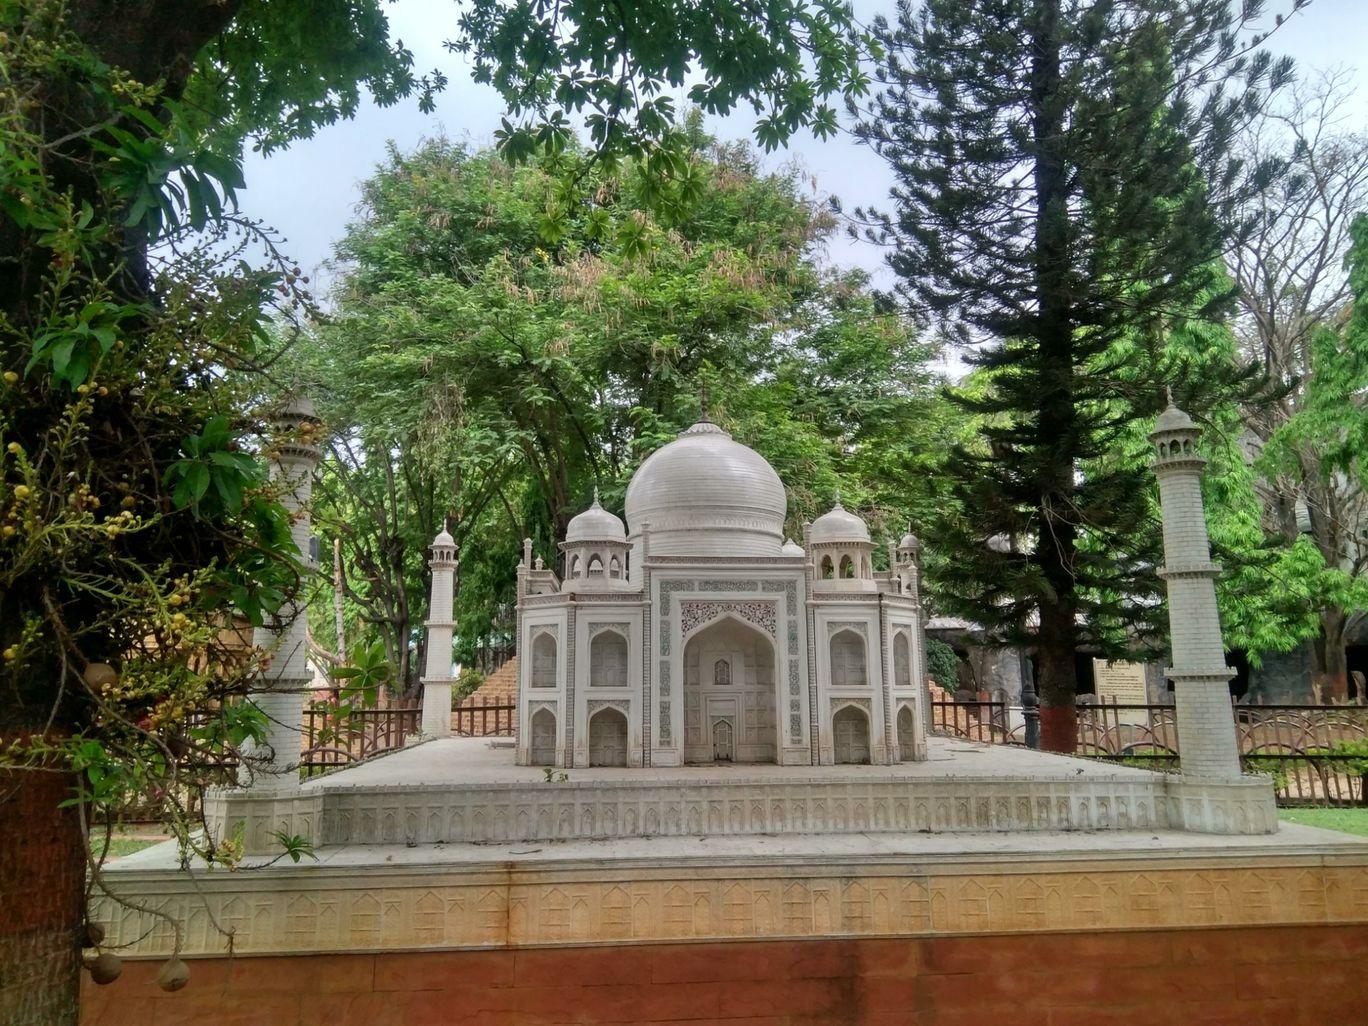 Photo of Yashwantrao Chavan Garden By Rahul Barde